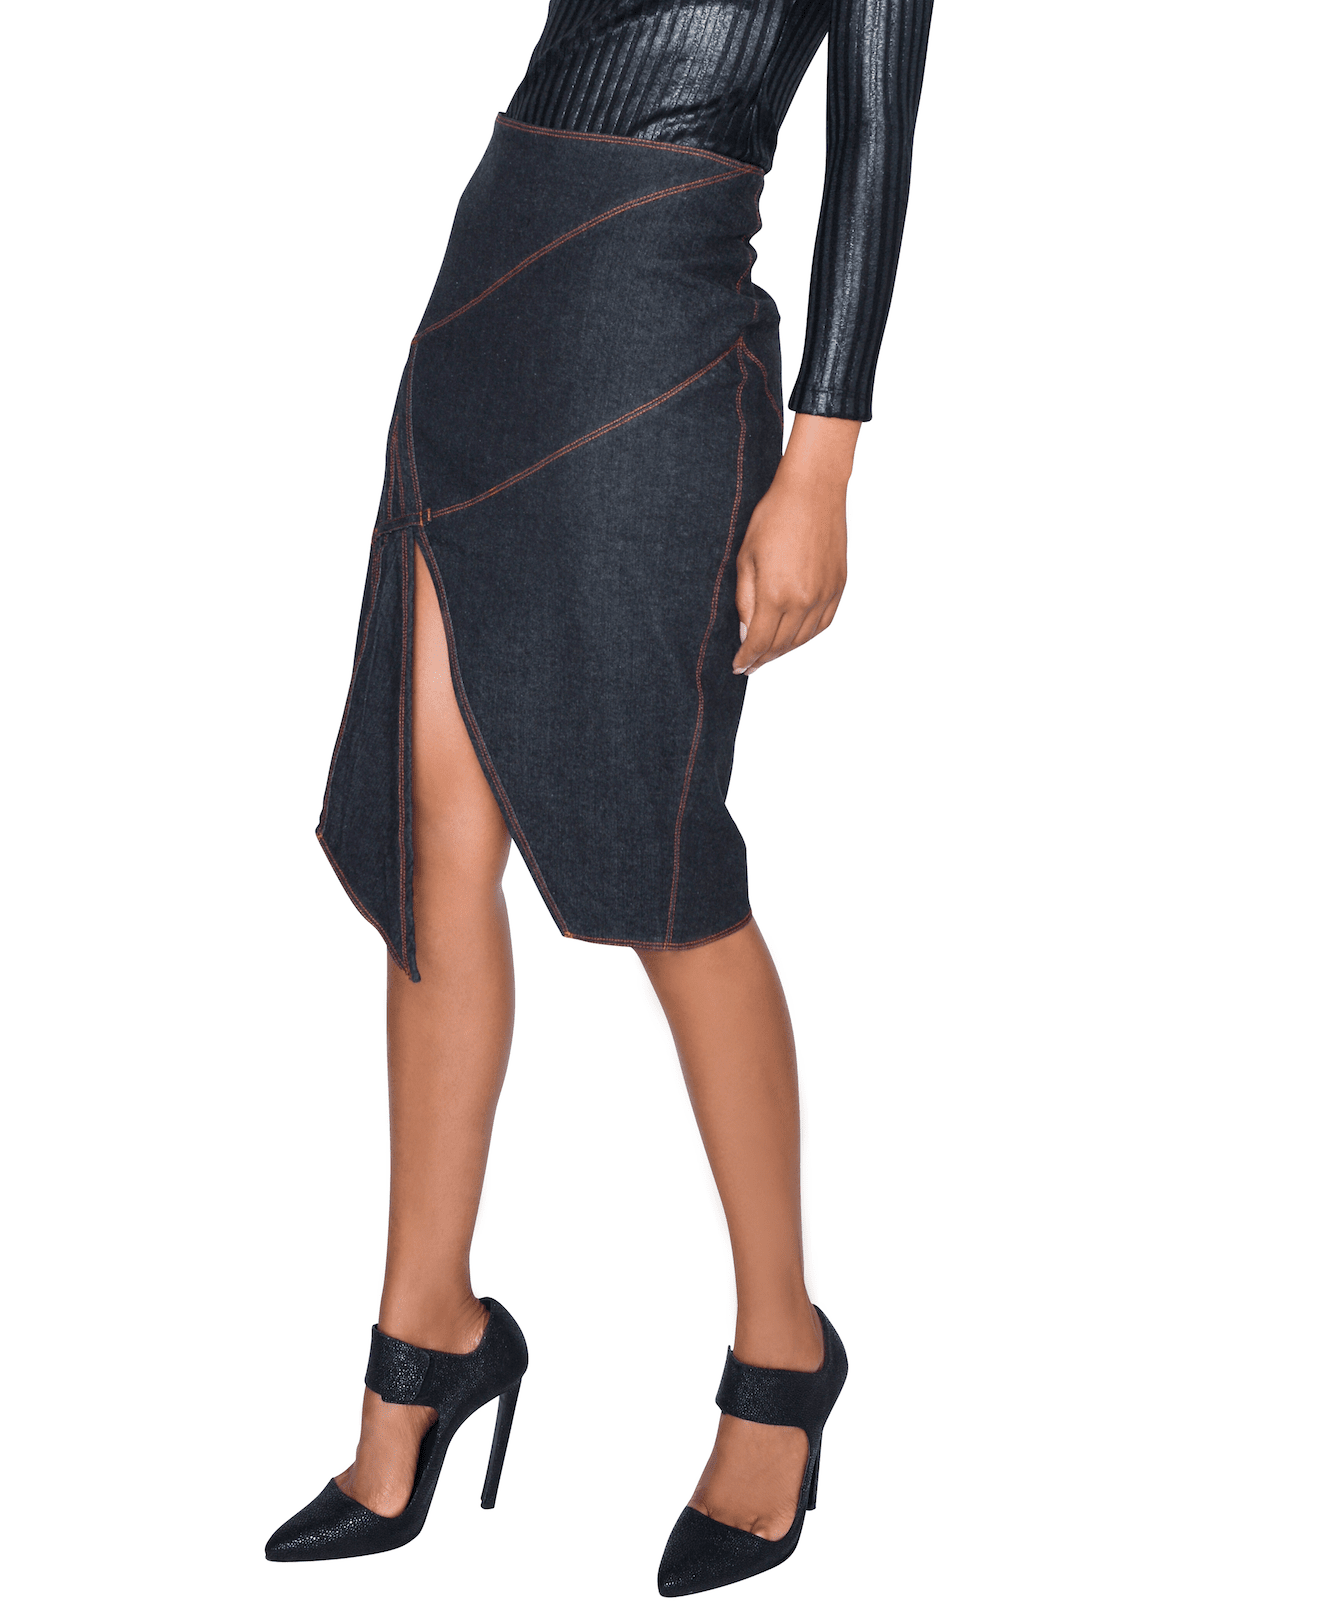 Skirt ALFIRK 0